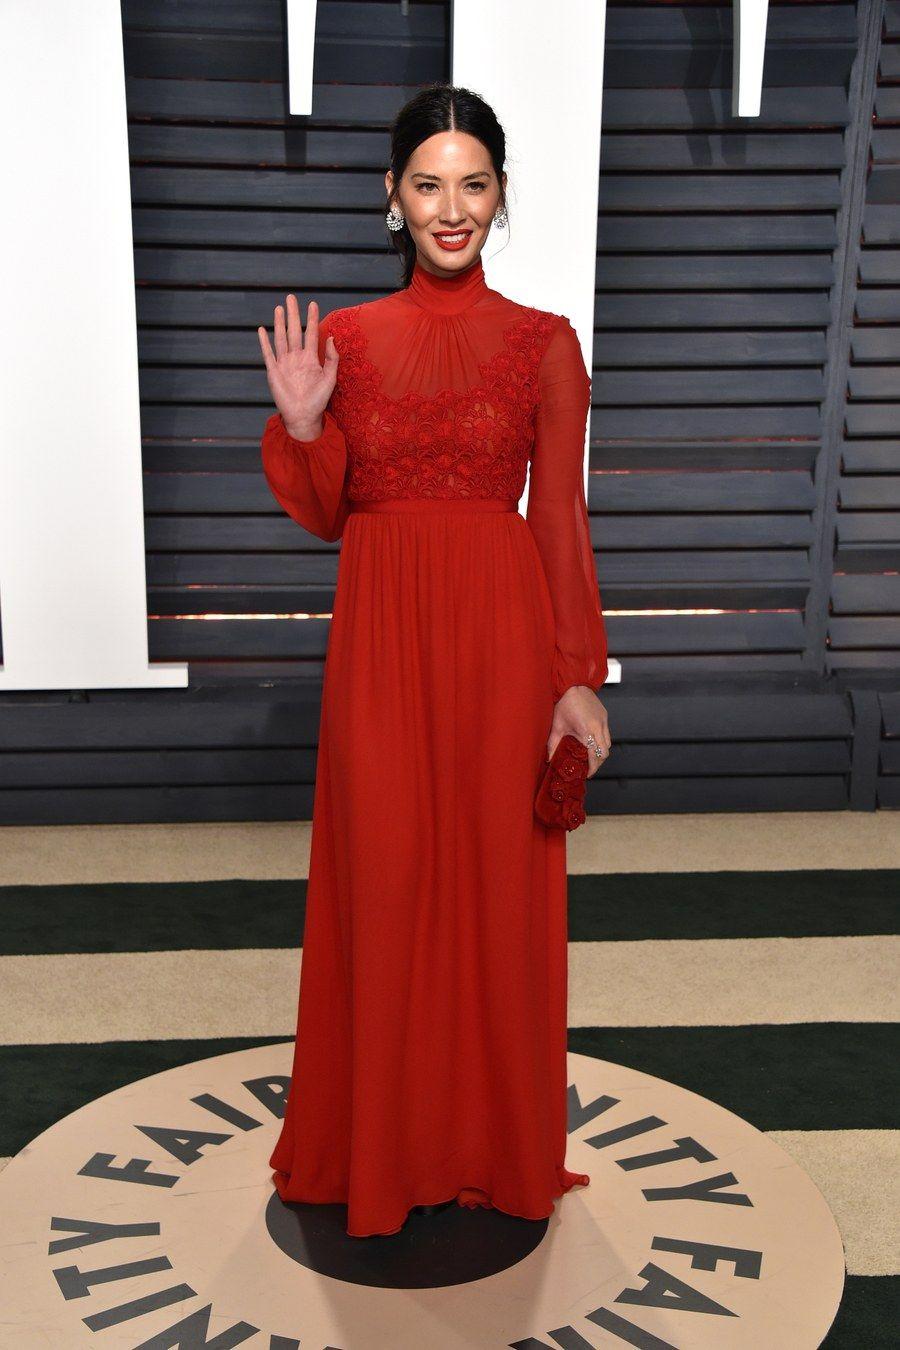 Olivia Munn in Giambattista Valli attends the 2017 Vanity Fair Oscar Party hosted by Graydon Carter.